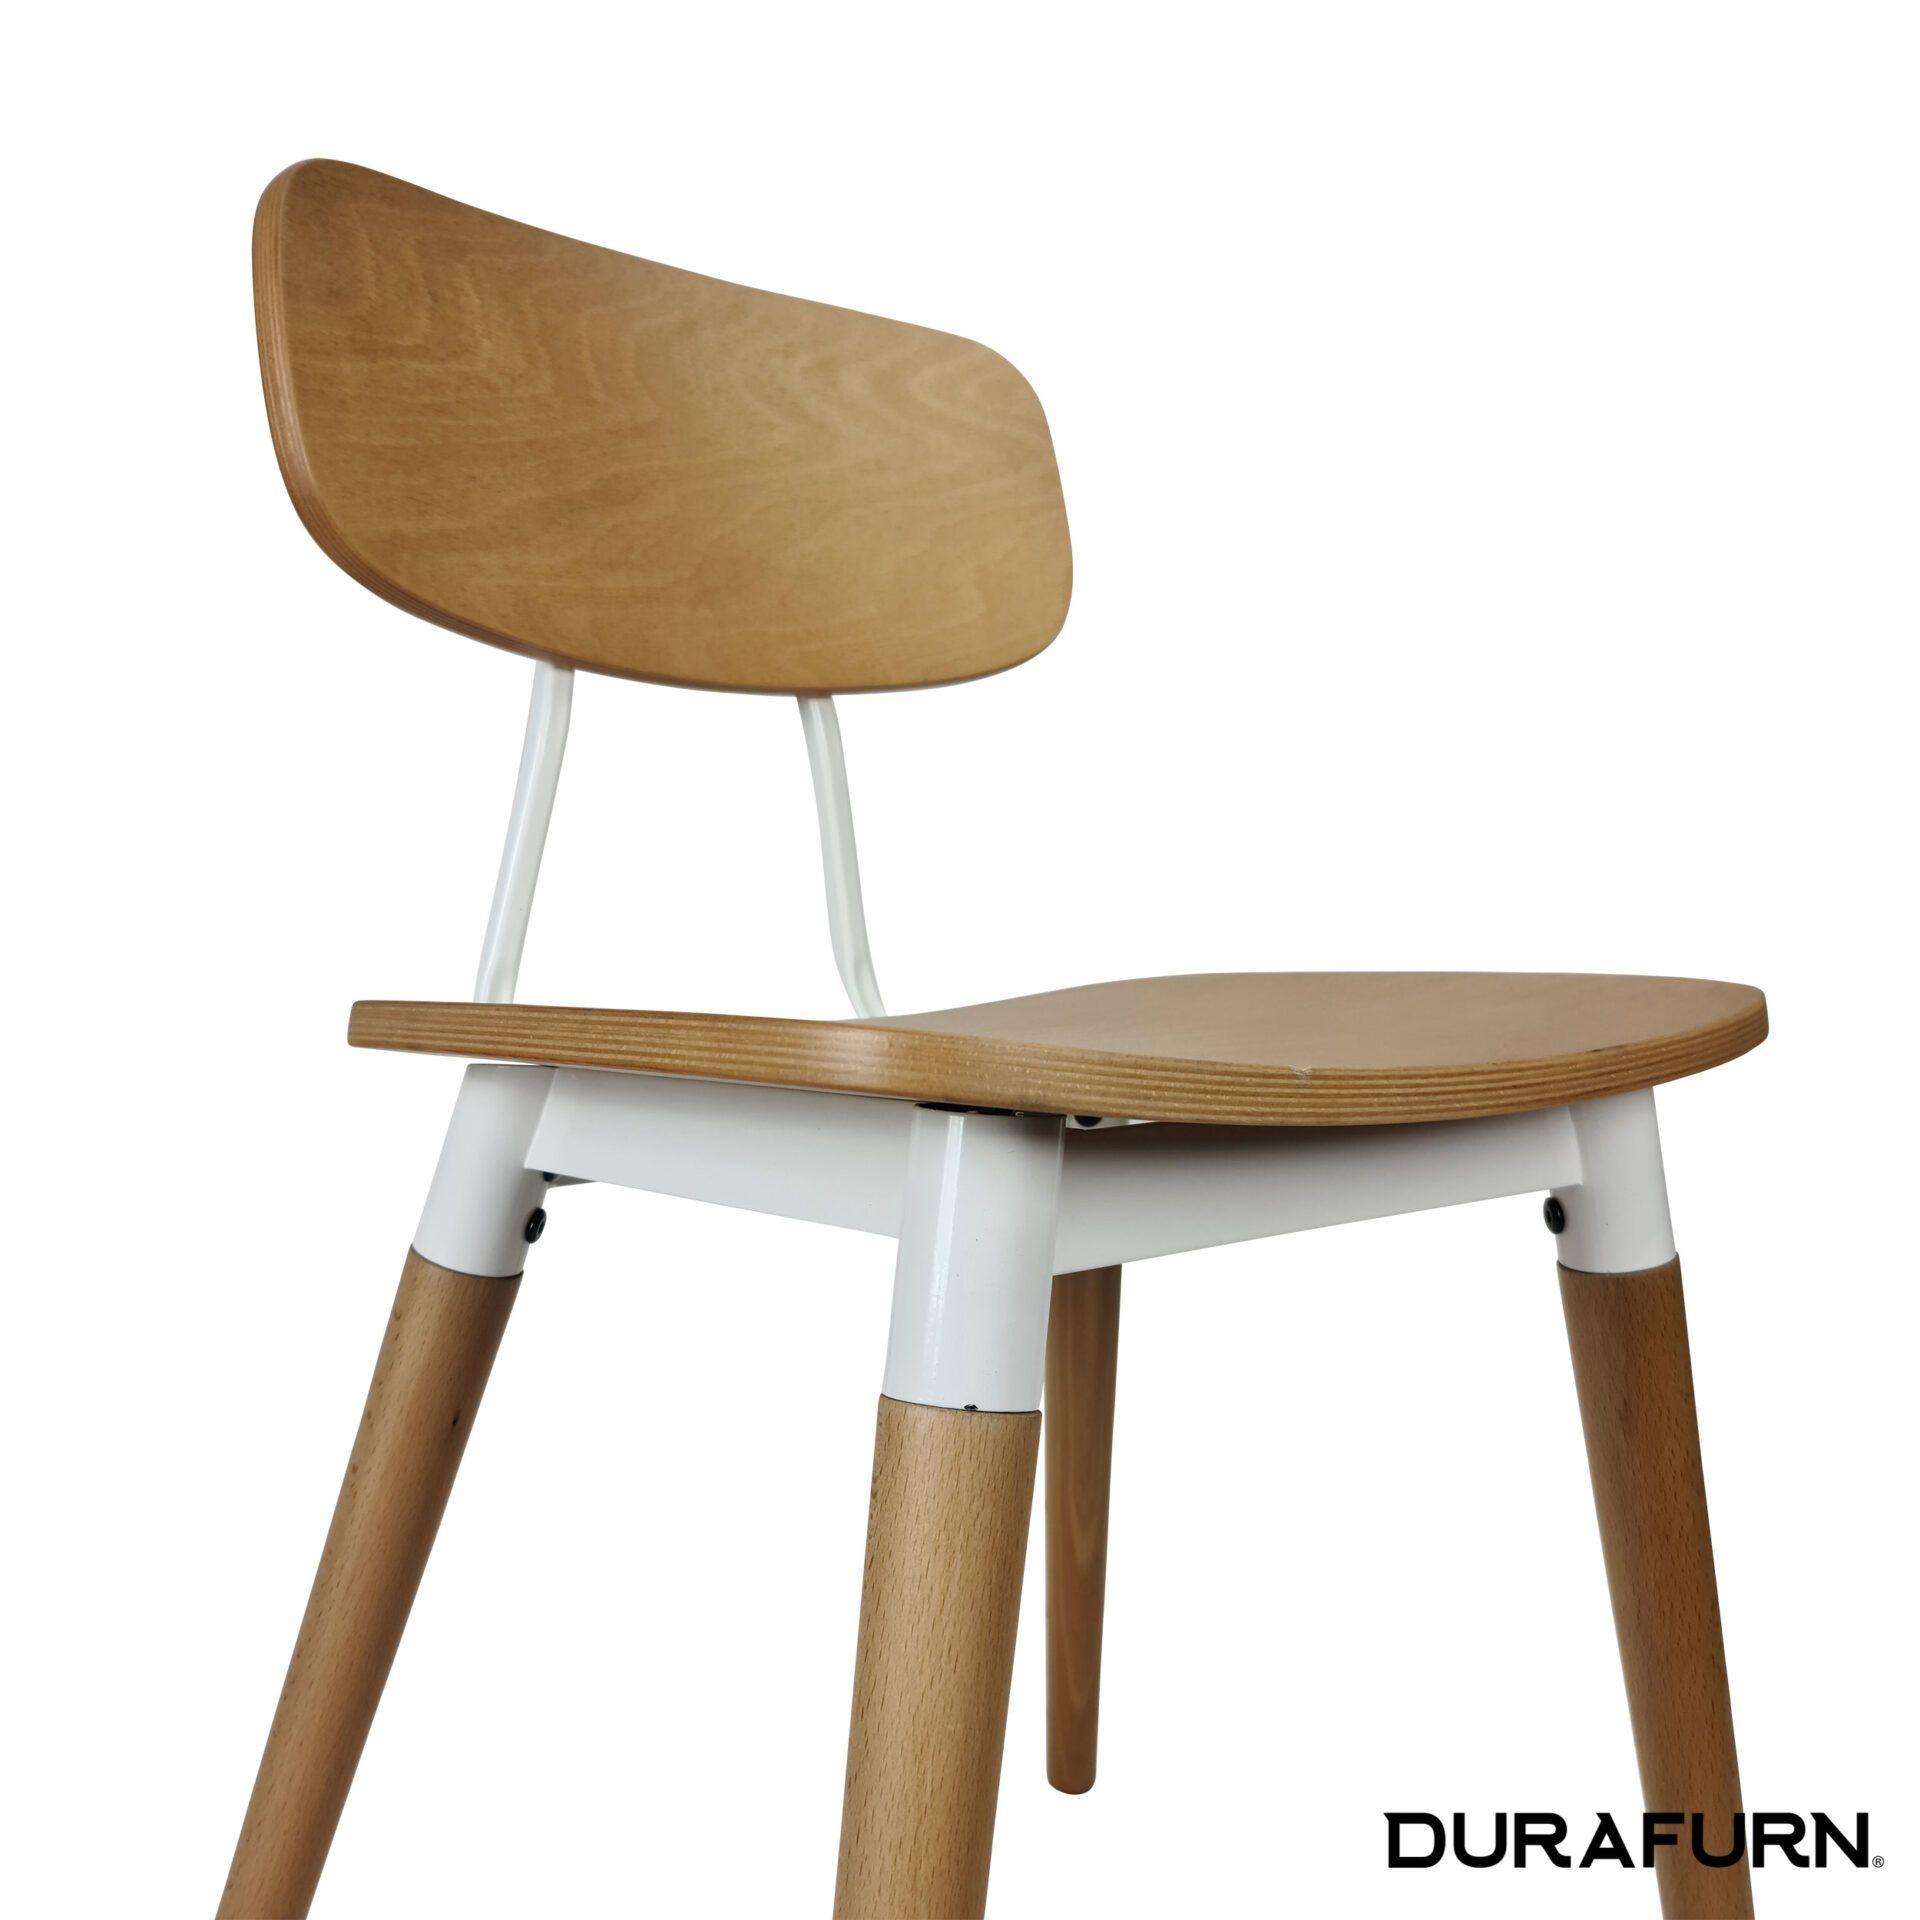 felix chair natural white.seat